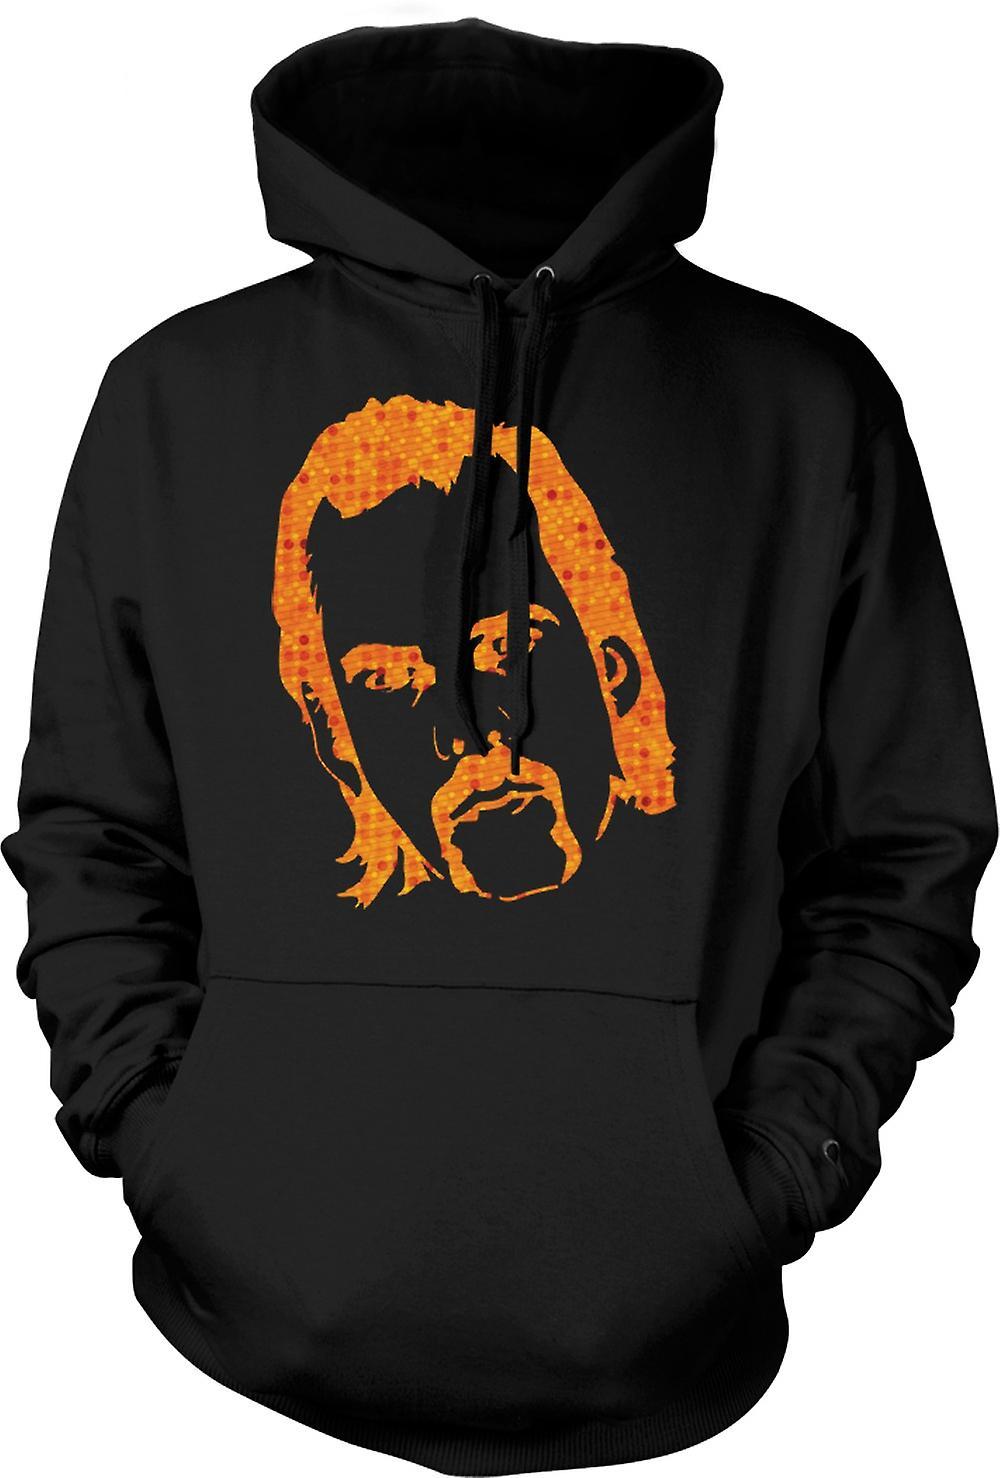 Mens Hoodie - Portrait de Nick Cave